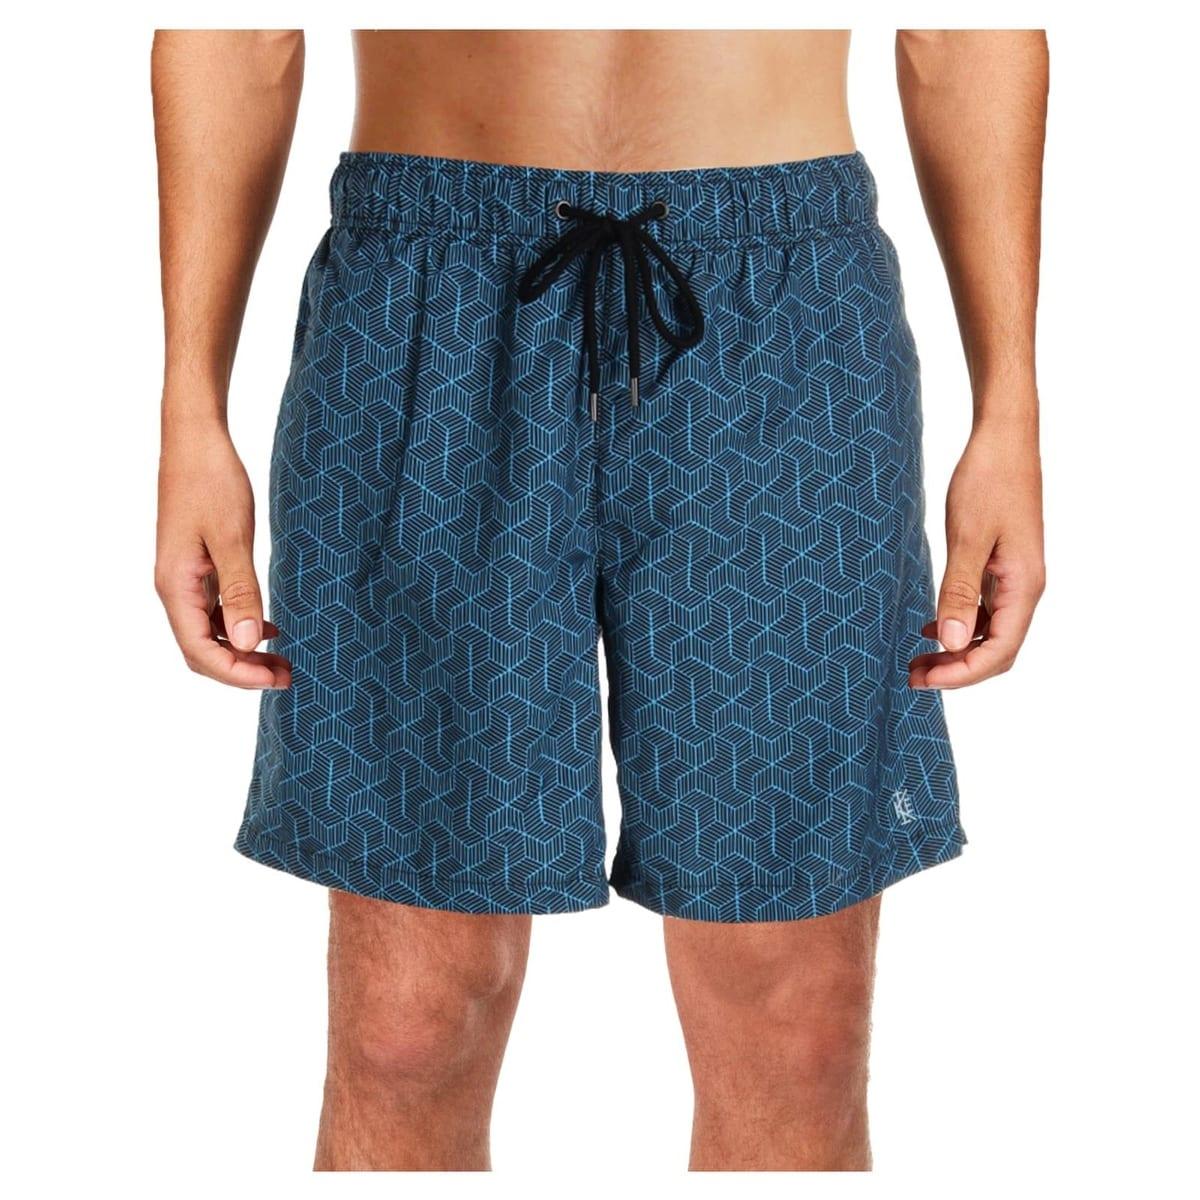 7348f313f0 IKE By Ike Behar Mens Retro Cube Printed Quick Dry Swim Trunks